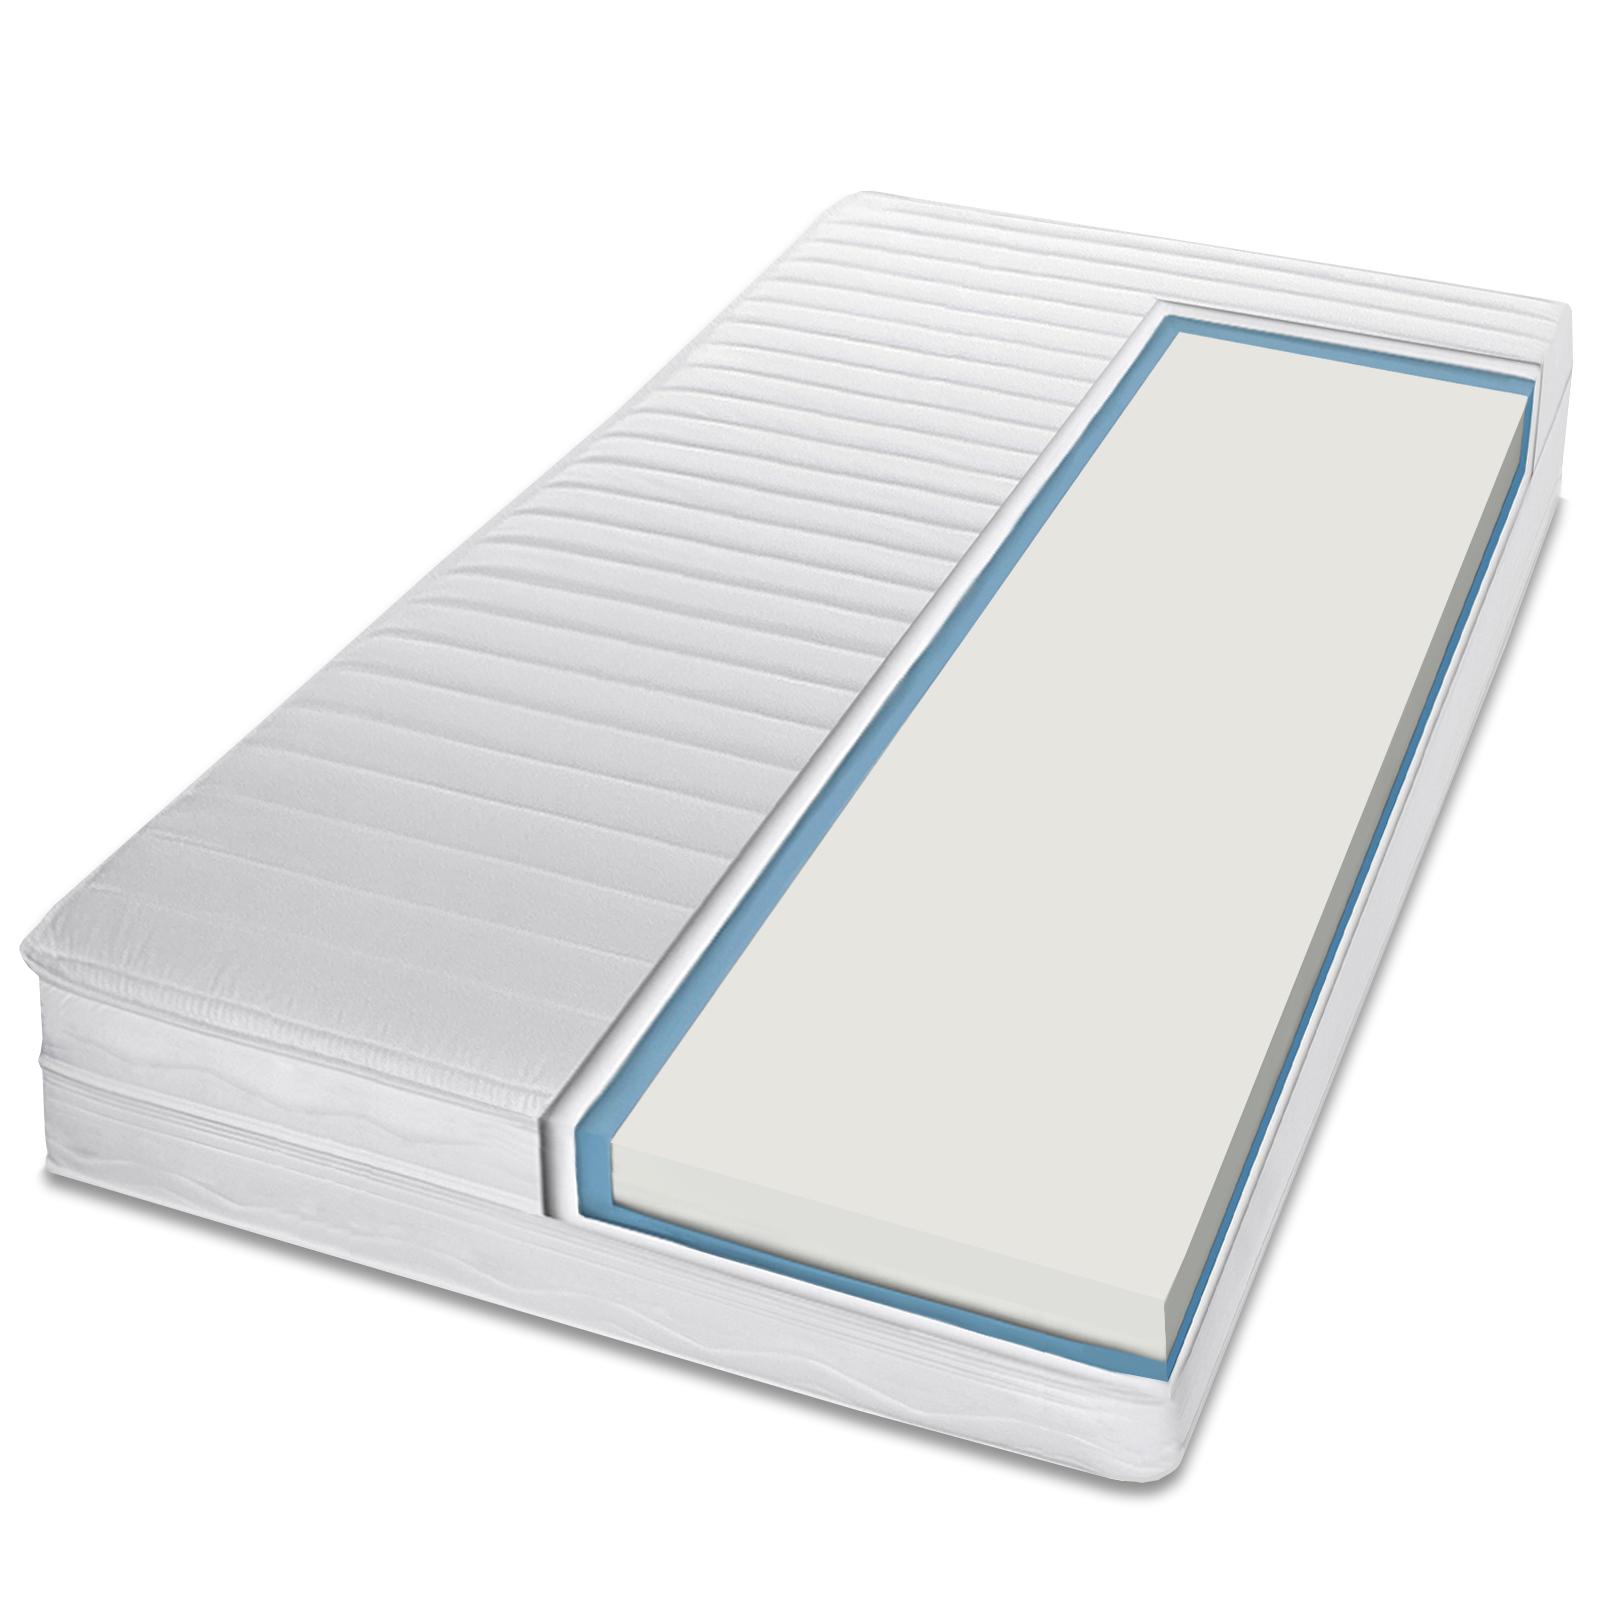 7 zonen wellness dream kaltschaum komfort matratze 7. Black Bedroom Furniture Sets. Home Design Ideas